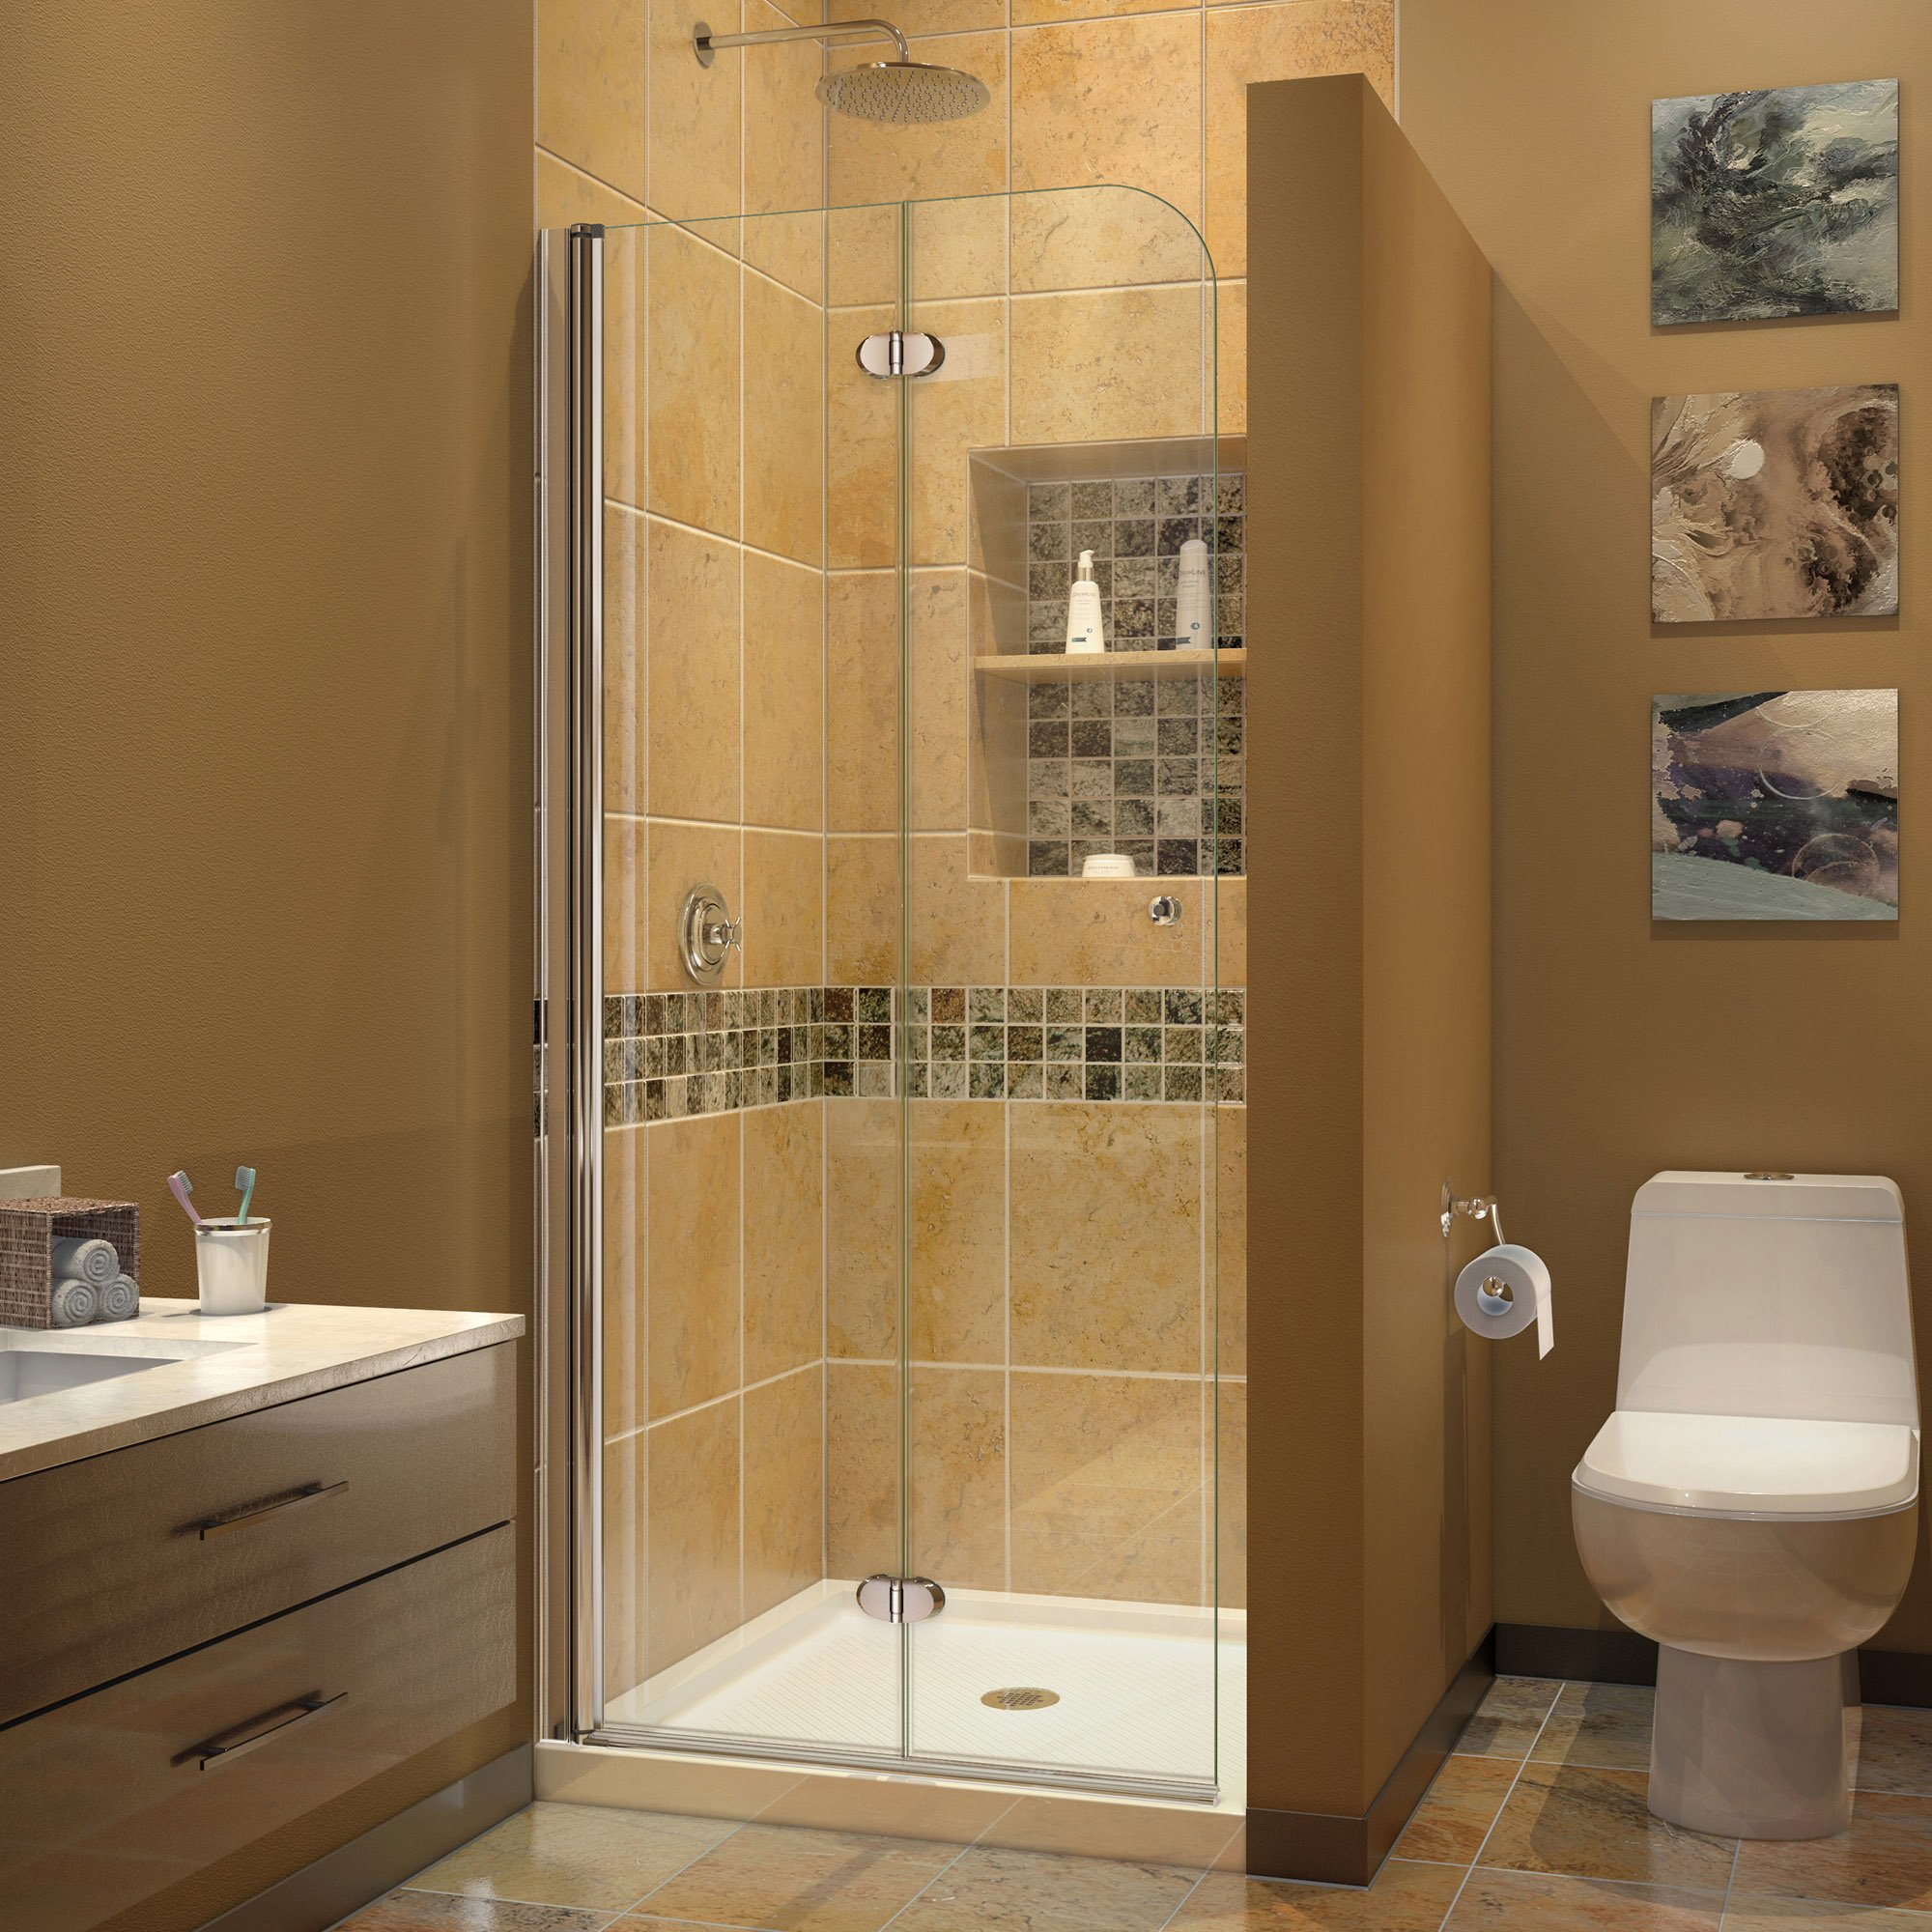 Dreamline Aqua Fold 33 12 In W X 72 In H Frameless Bi Fold Shower